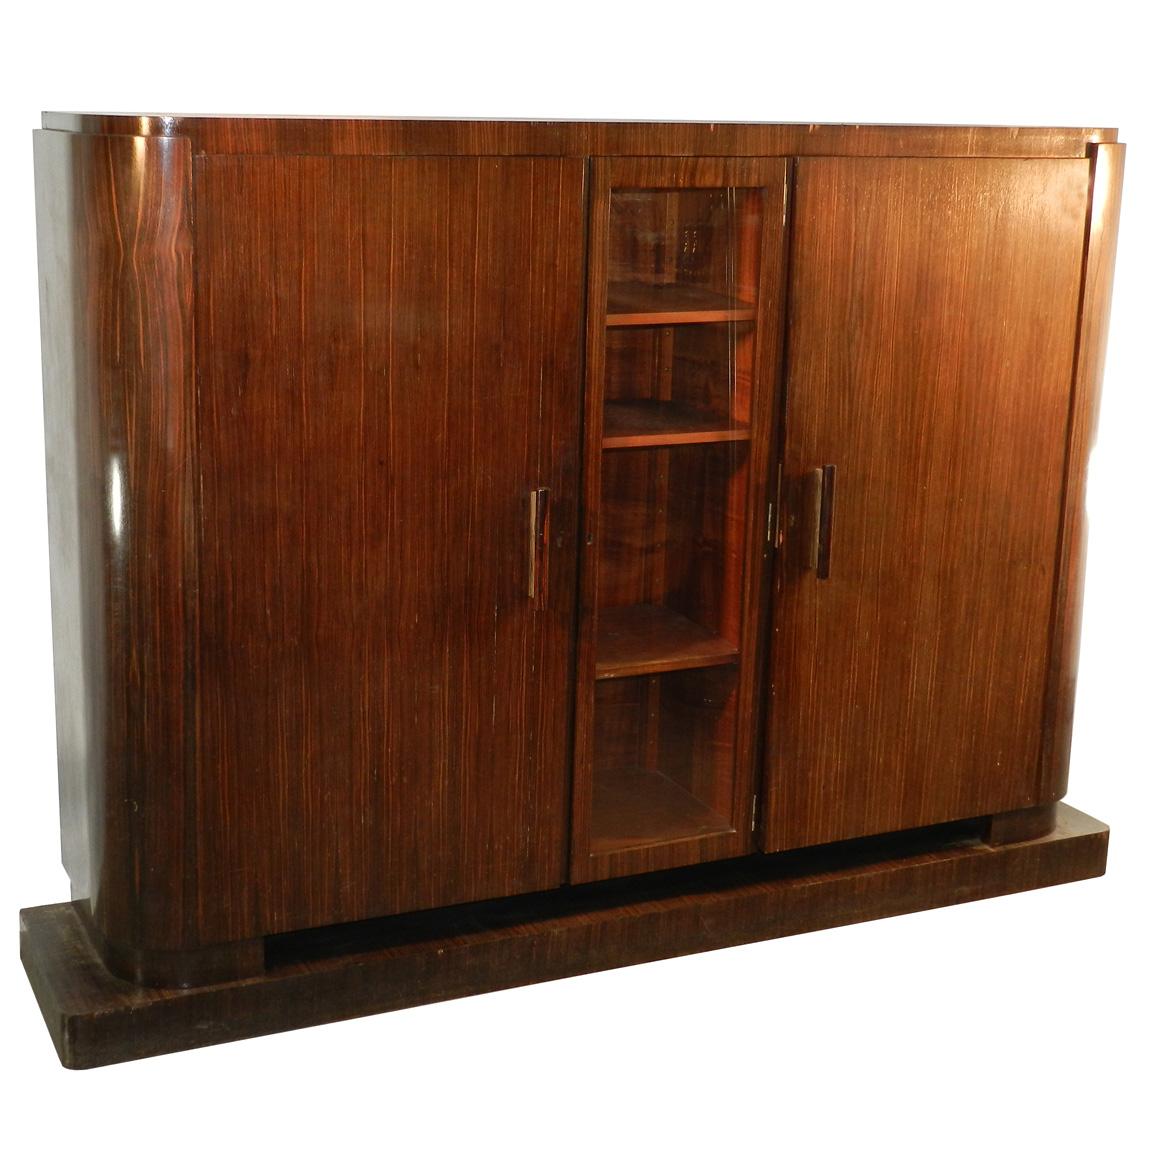 Decoene Freres, Cabinet Art Deco Ebene Veneer From Macassar-photo-4